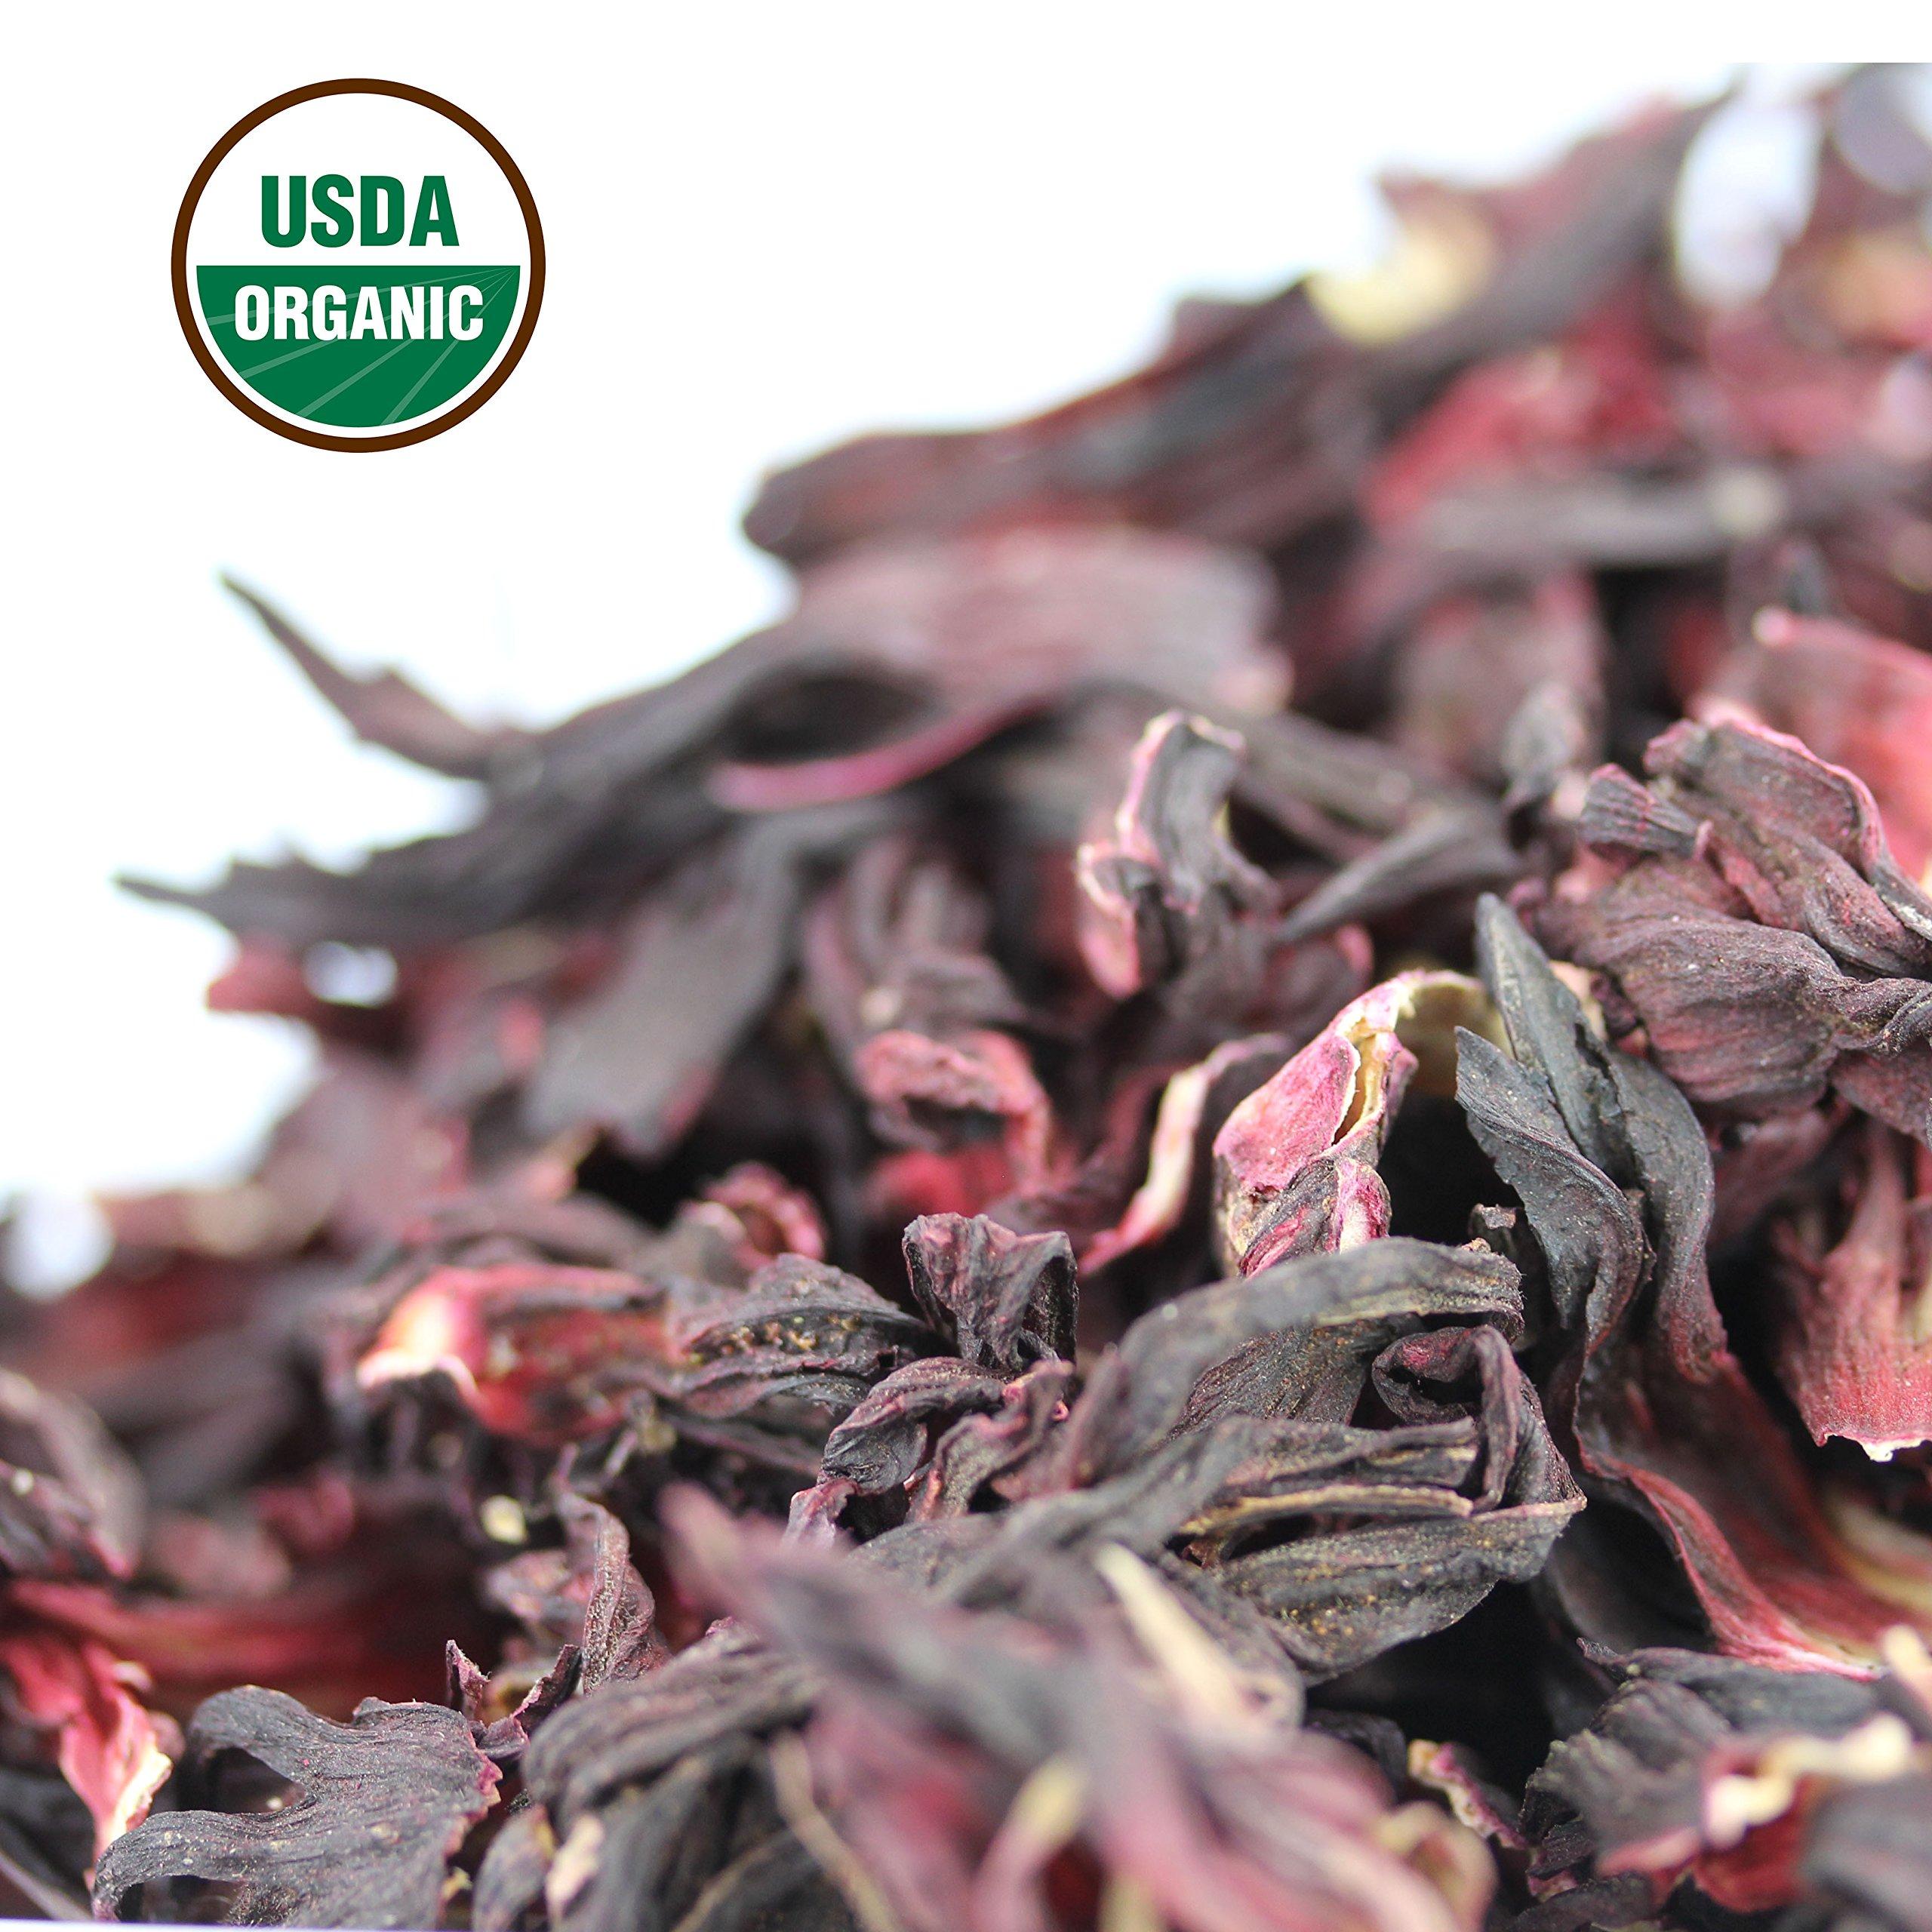 Hibiscus Tea 1LB (16Oz) 100% CERTIFIED Organic Hibiscus Flowers Herbal Tea (WHOLE PETALS), Caffeine Free in 1 lbs. Bulk Resealable Kraft BPA free Bags from U.S. Wellness by U.S. Wellness Naturals (Image #6)